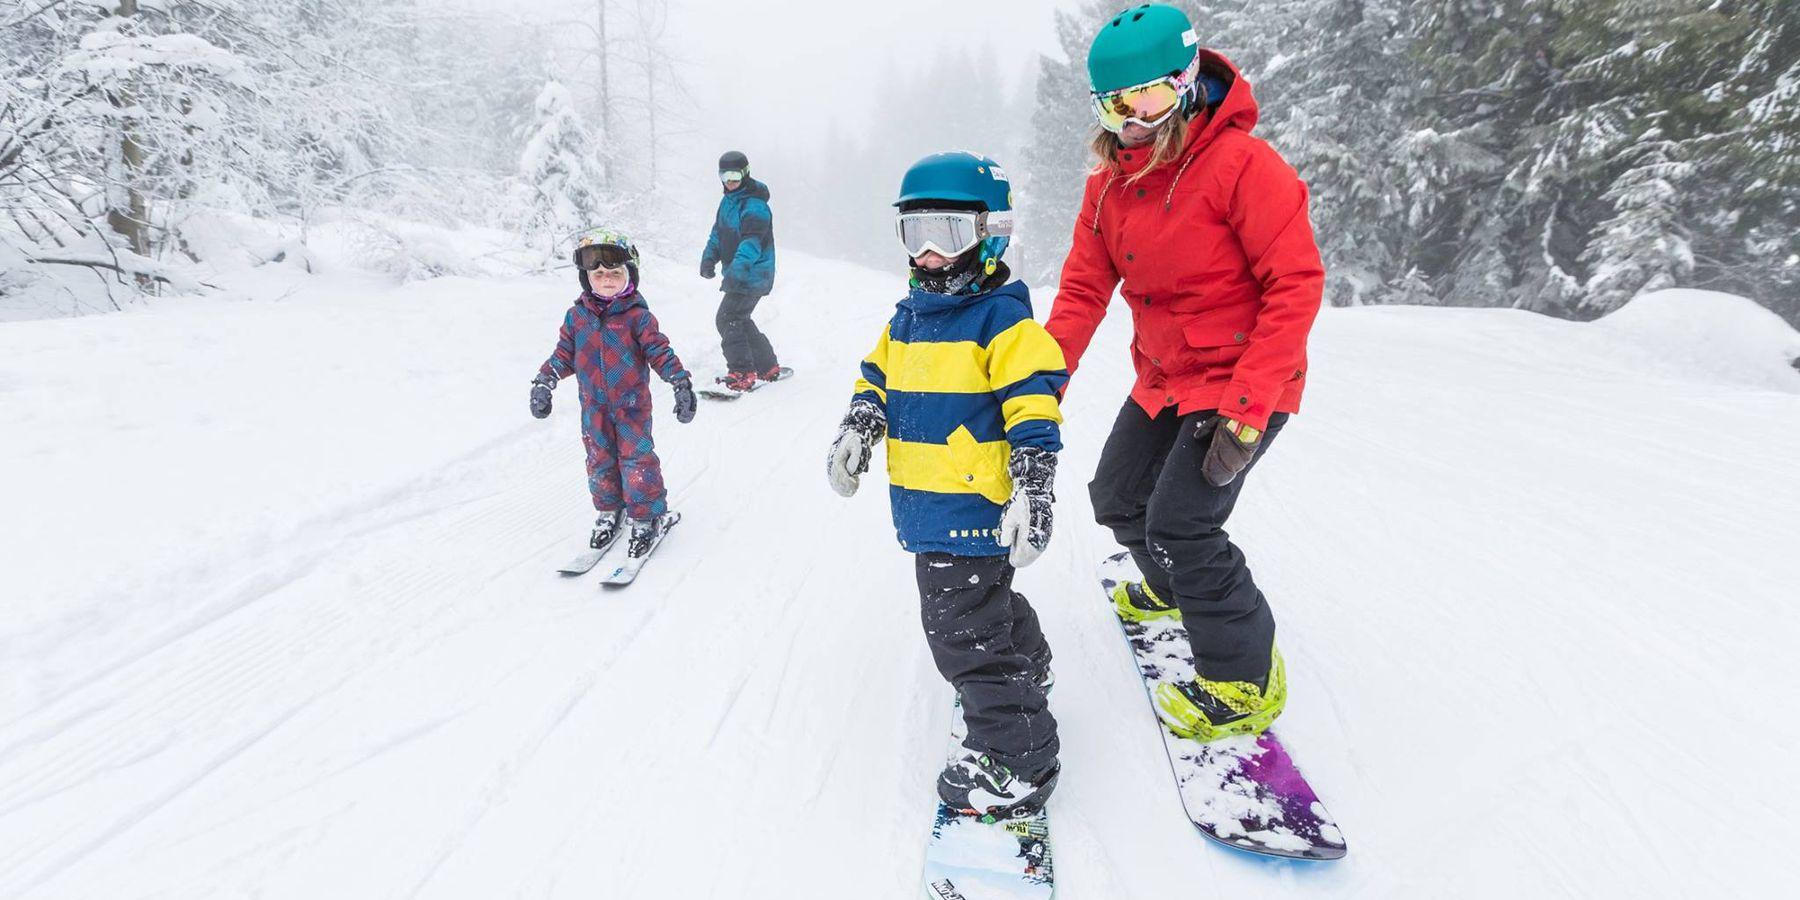 Wintersport - Red Mountain Resort - British Columbia - Canada - Doets Reizen